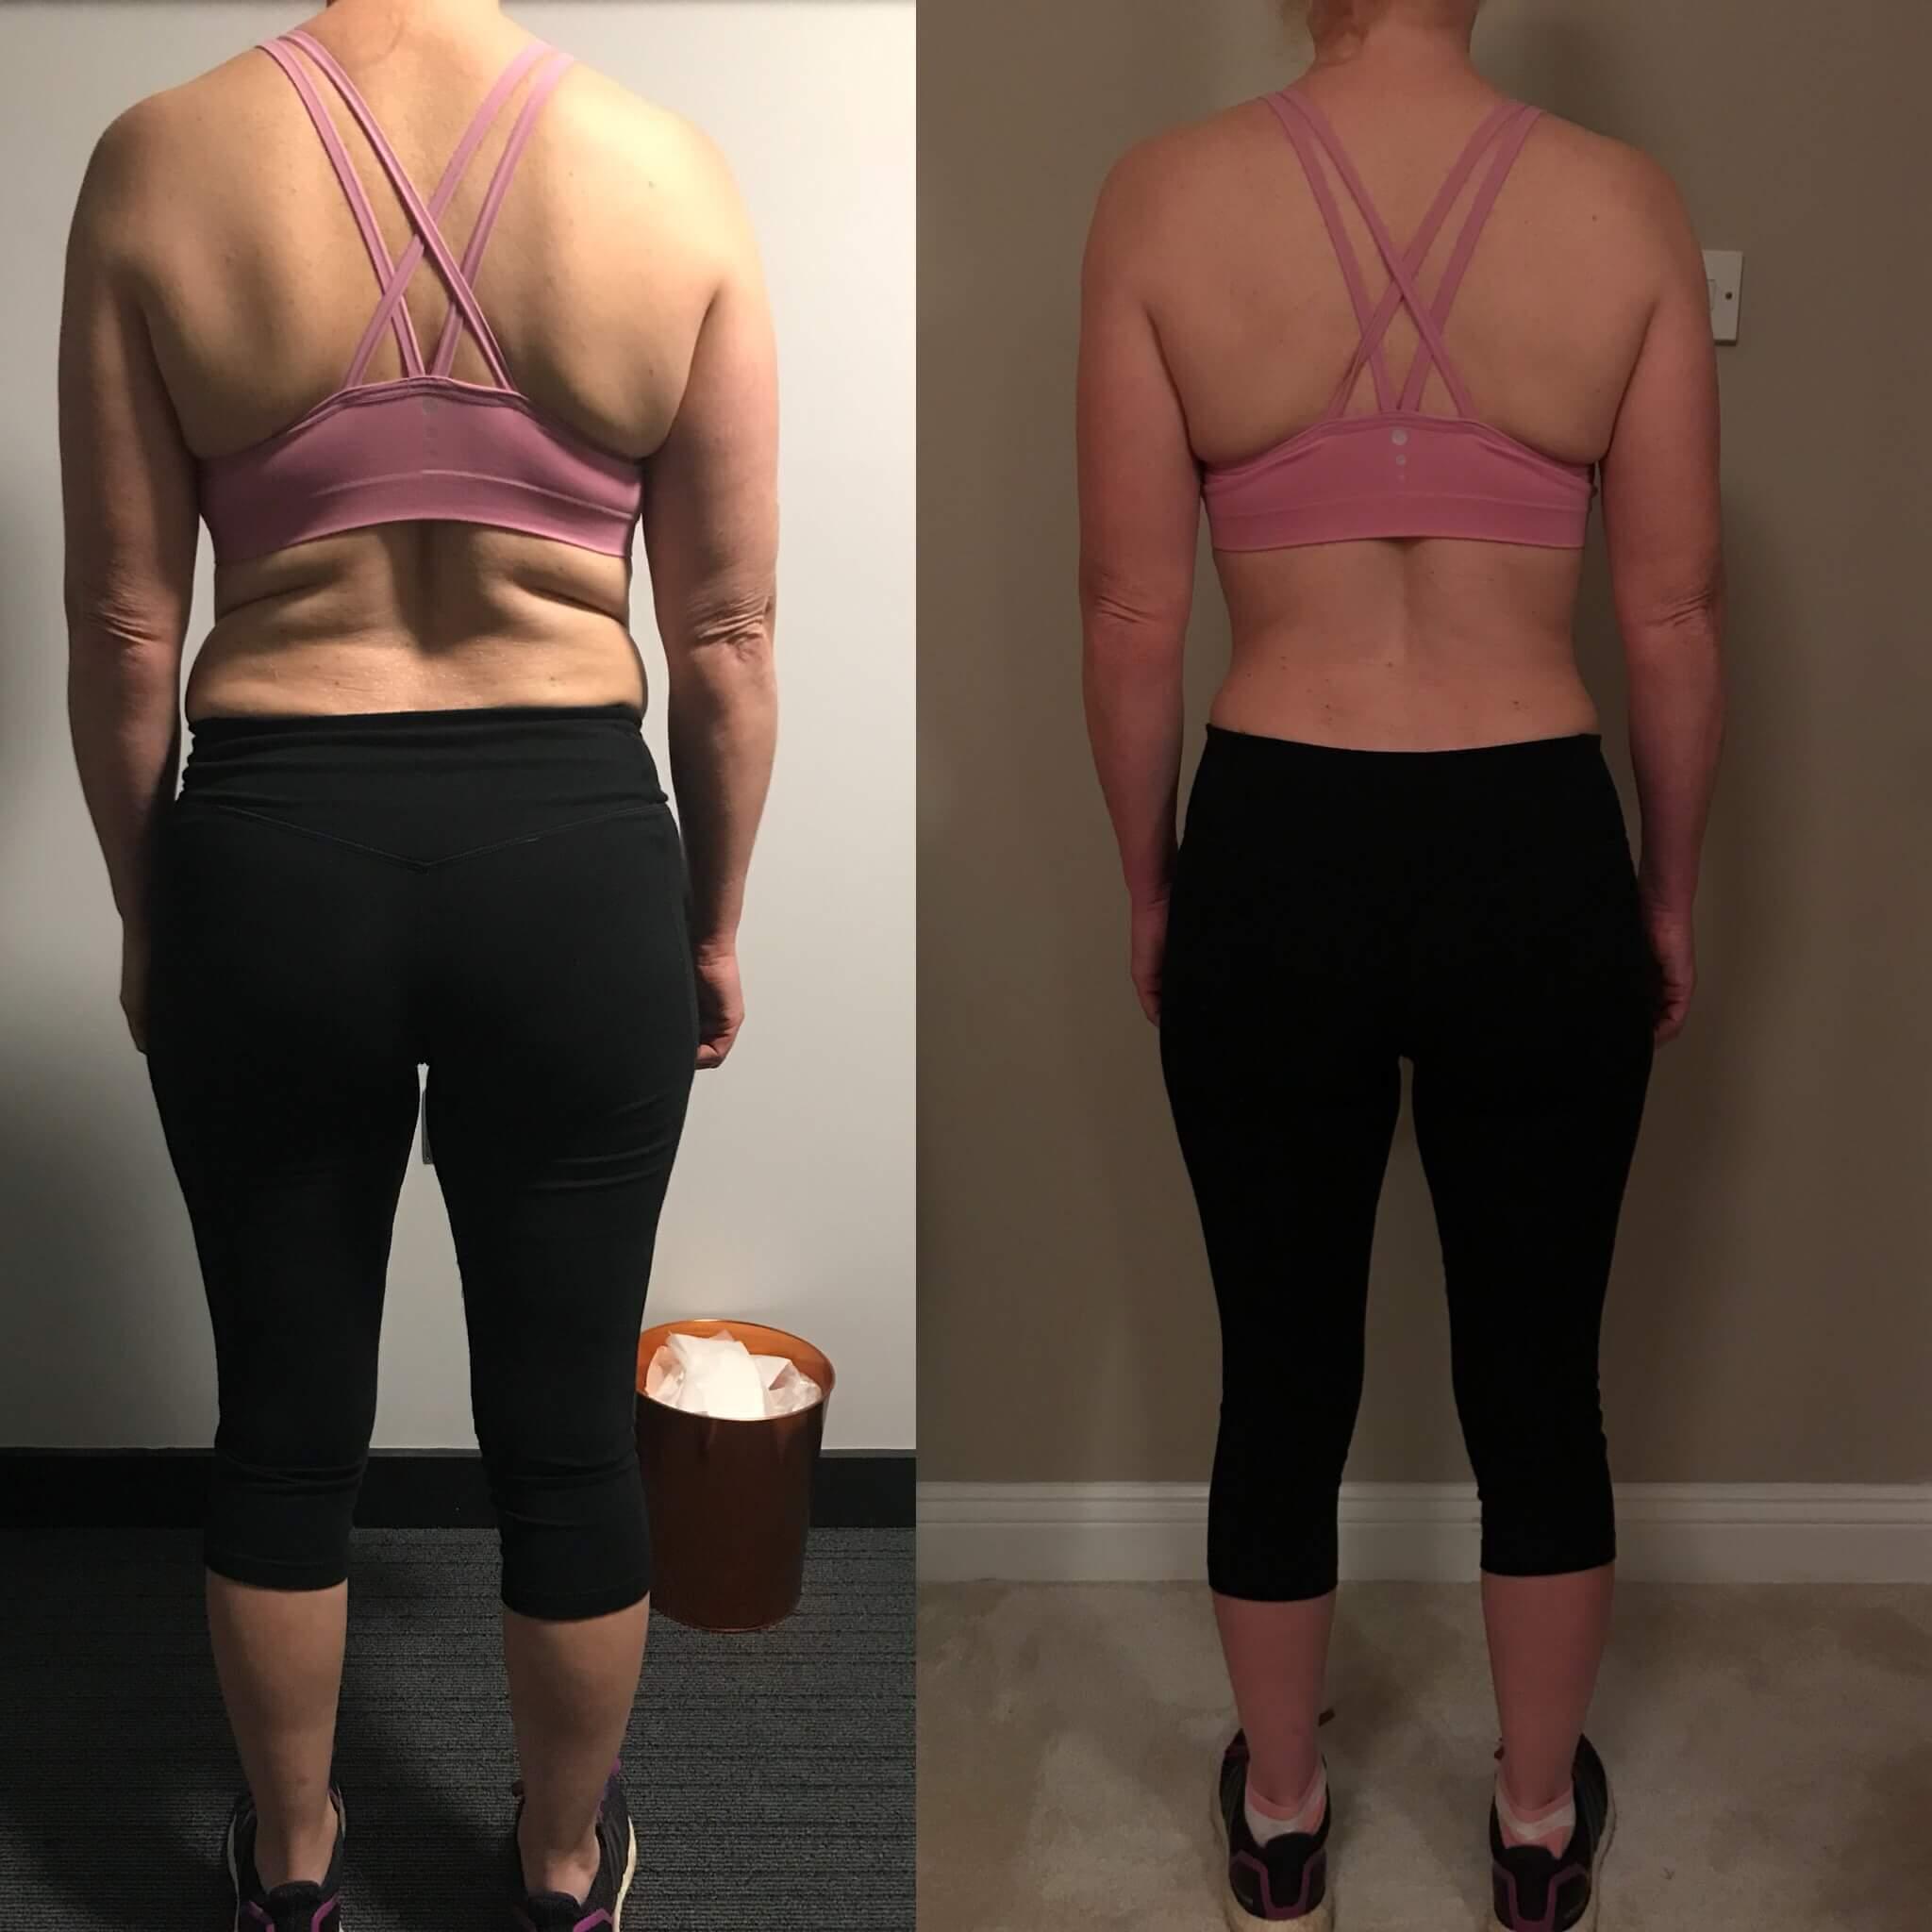 woman transformation photo